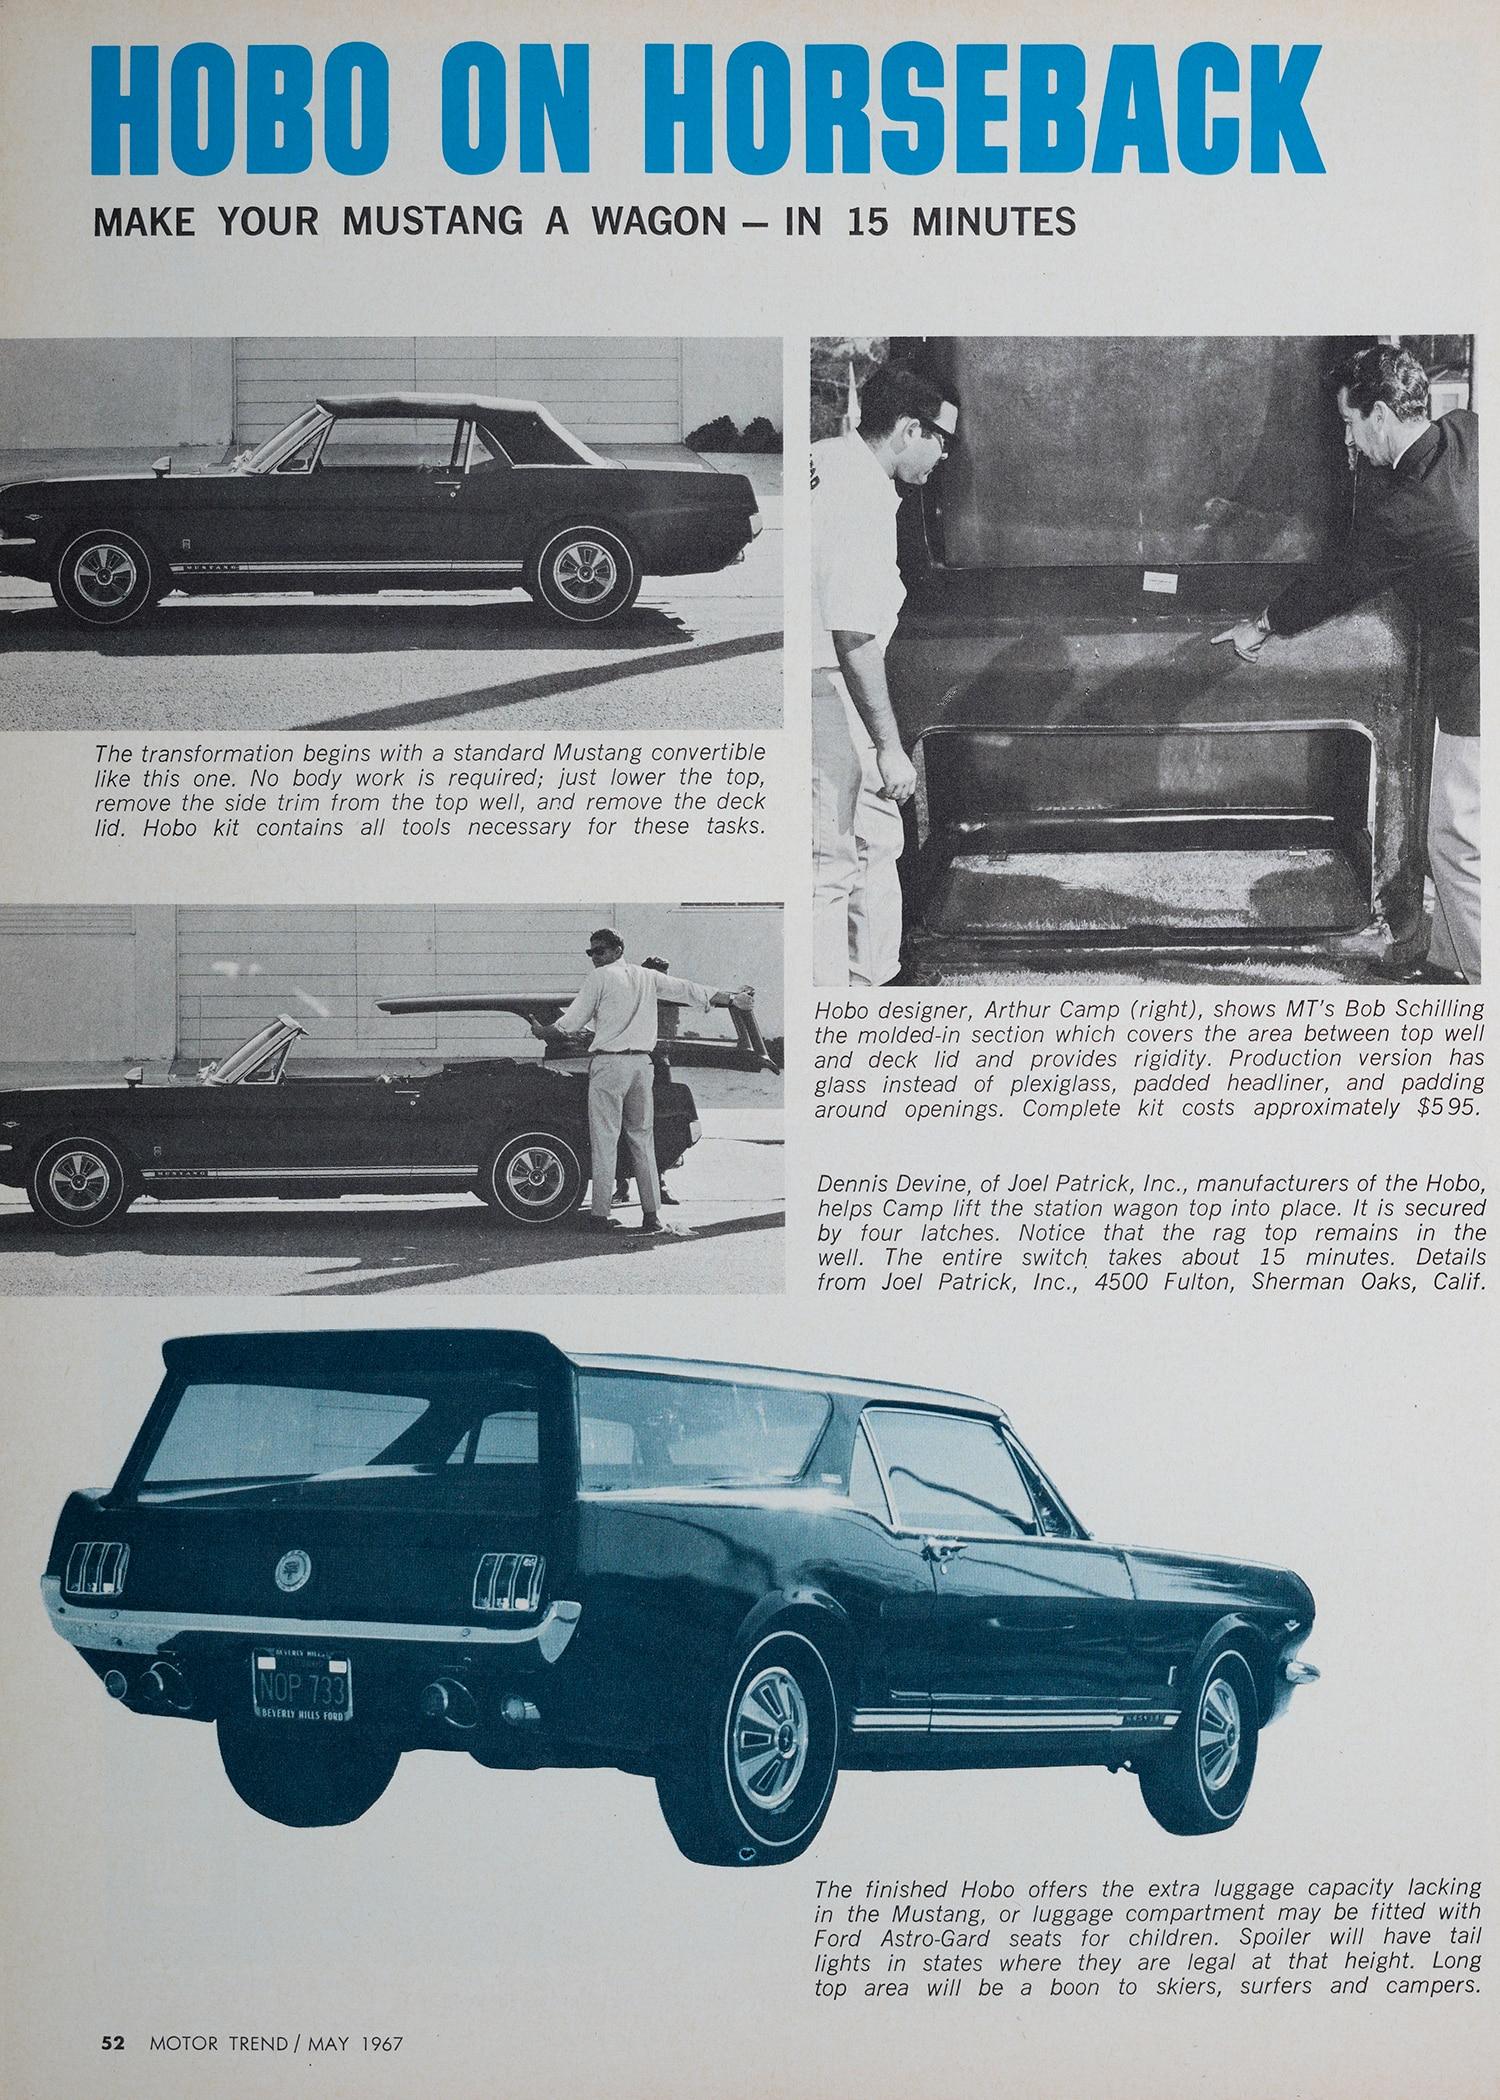 4 1965 Ford Mustang Tear Sheet